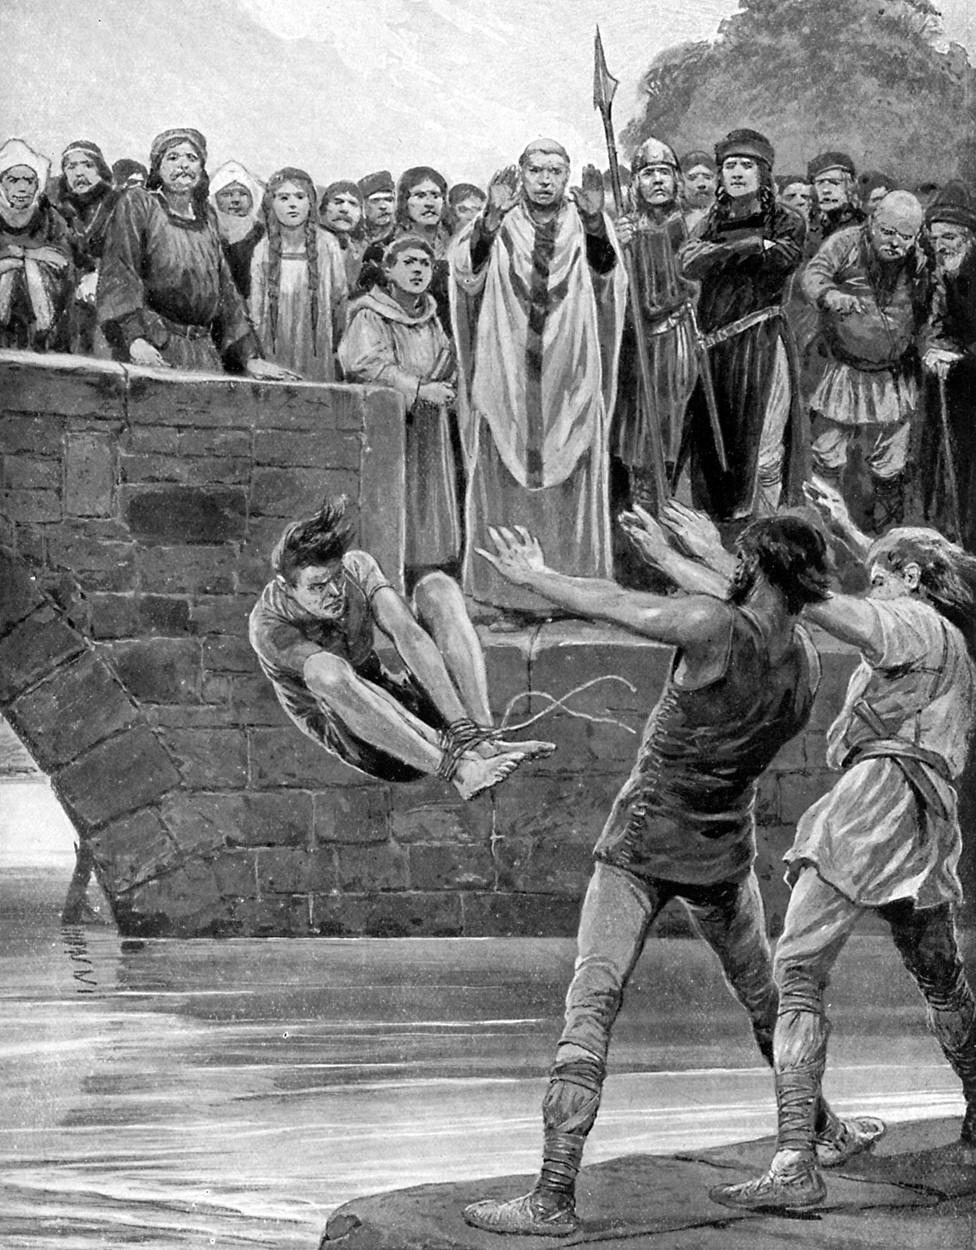 Print of men throwing bound man into river